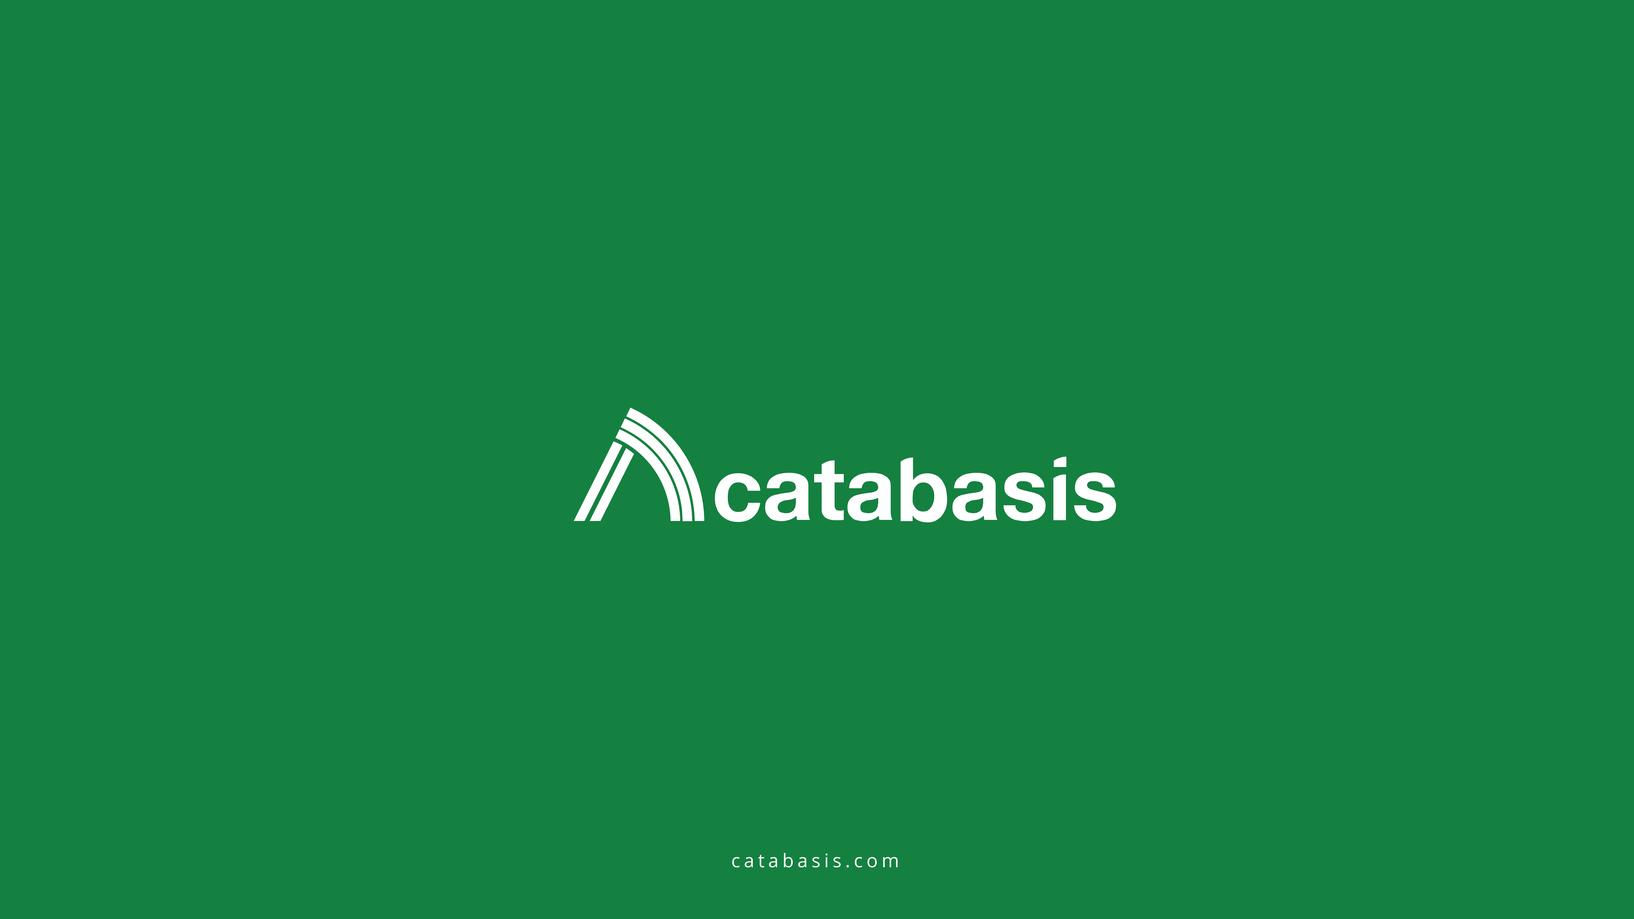 https://cdn.kscope.io/84f30625c3fb9af73f1dac4af363b397-New Microsoft Word Document_catabasis corporate presentationpage001junpage021_page019.jpg